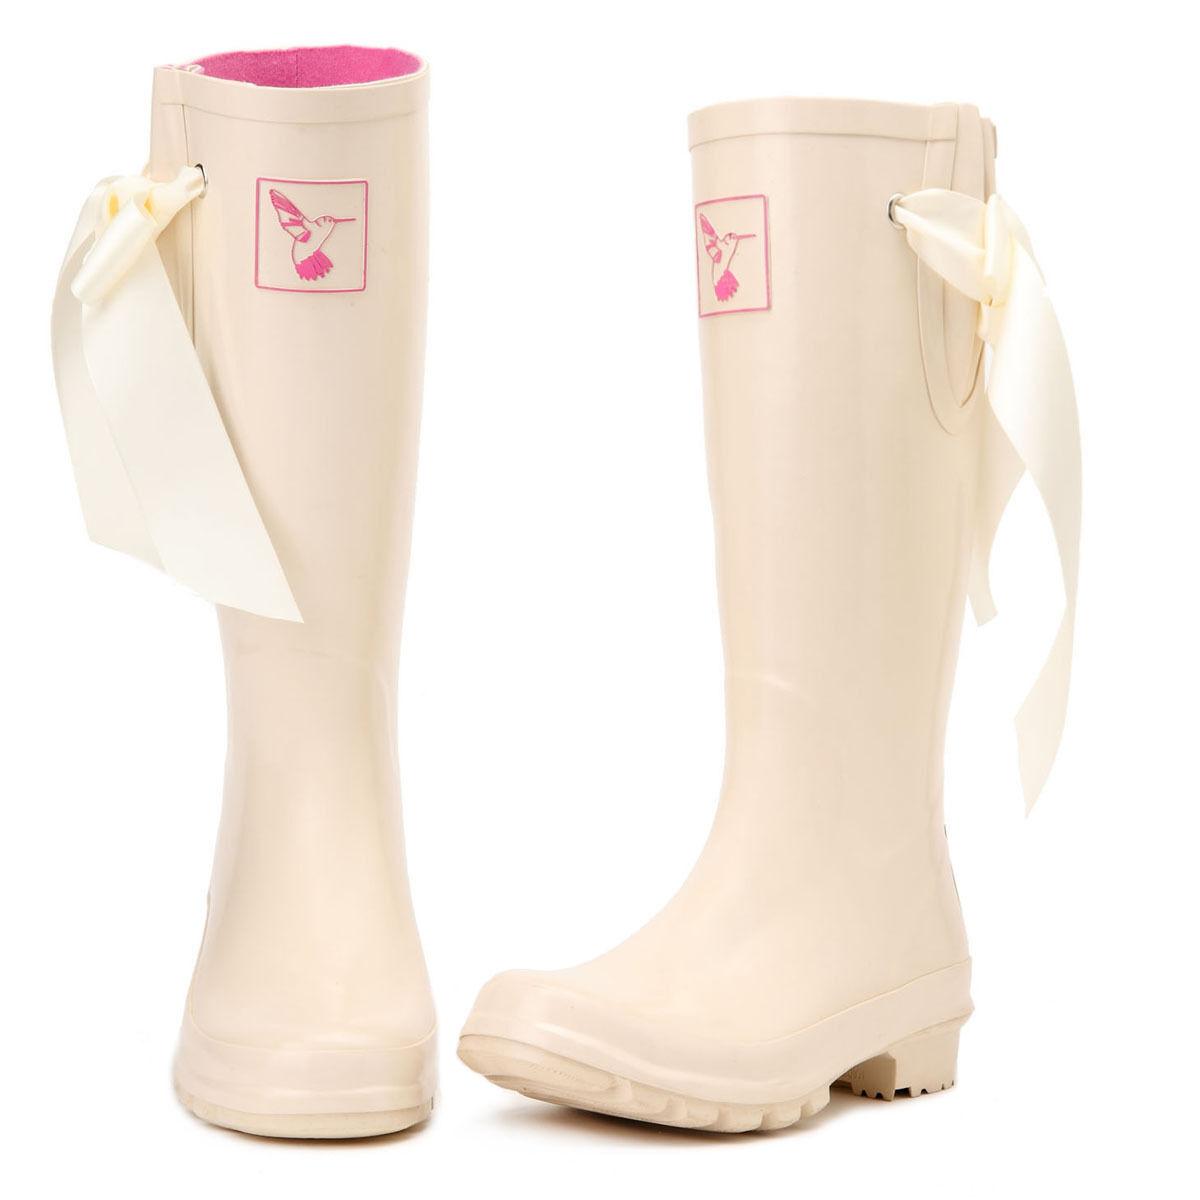 Evercreatures Knee-High Boot Rubber Milky Wedding Rain Boots Wellies